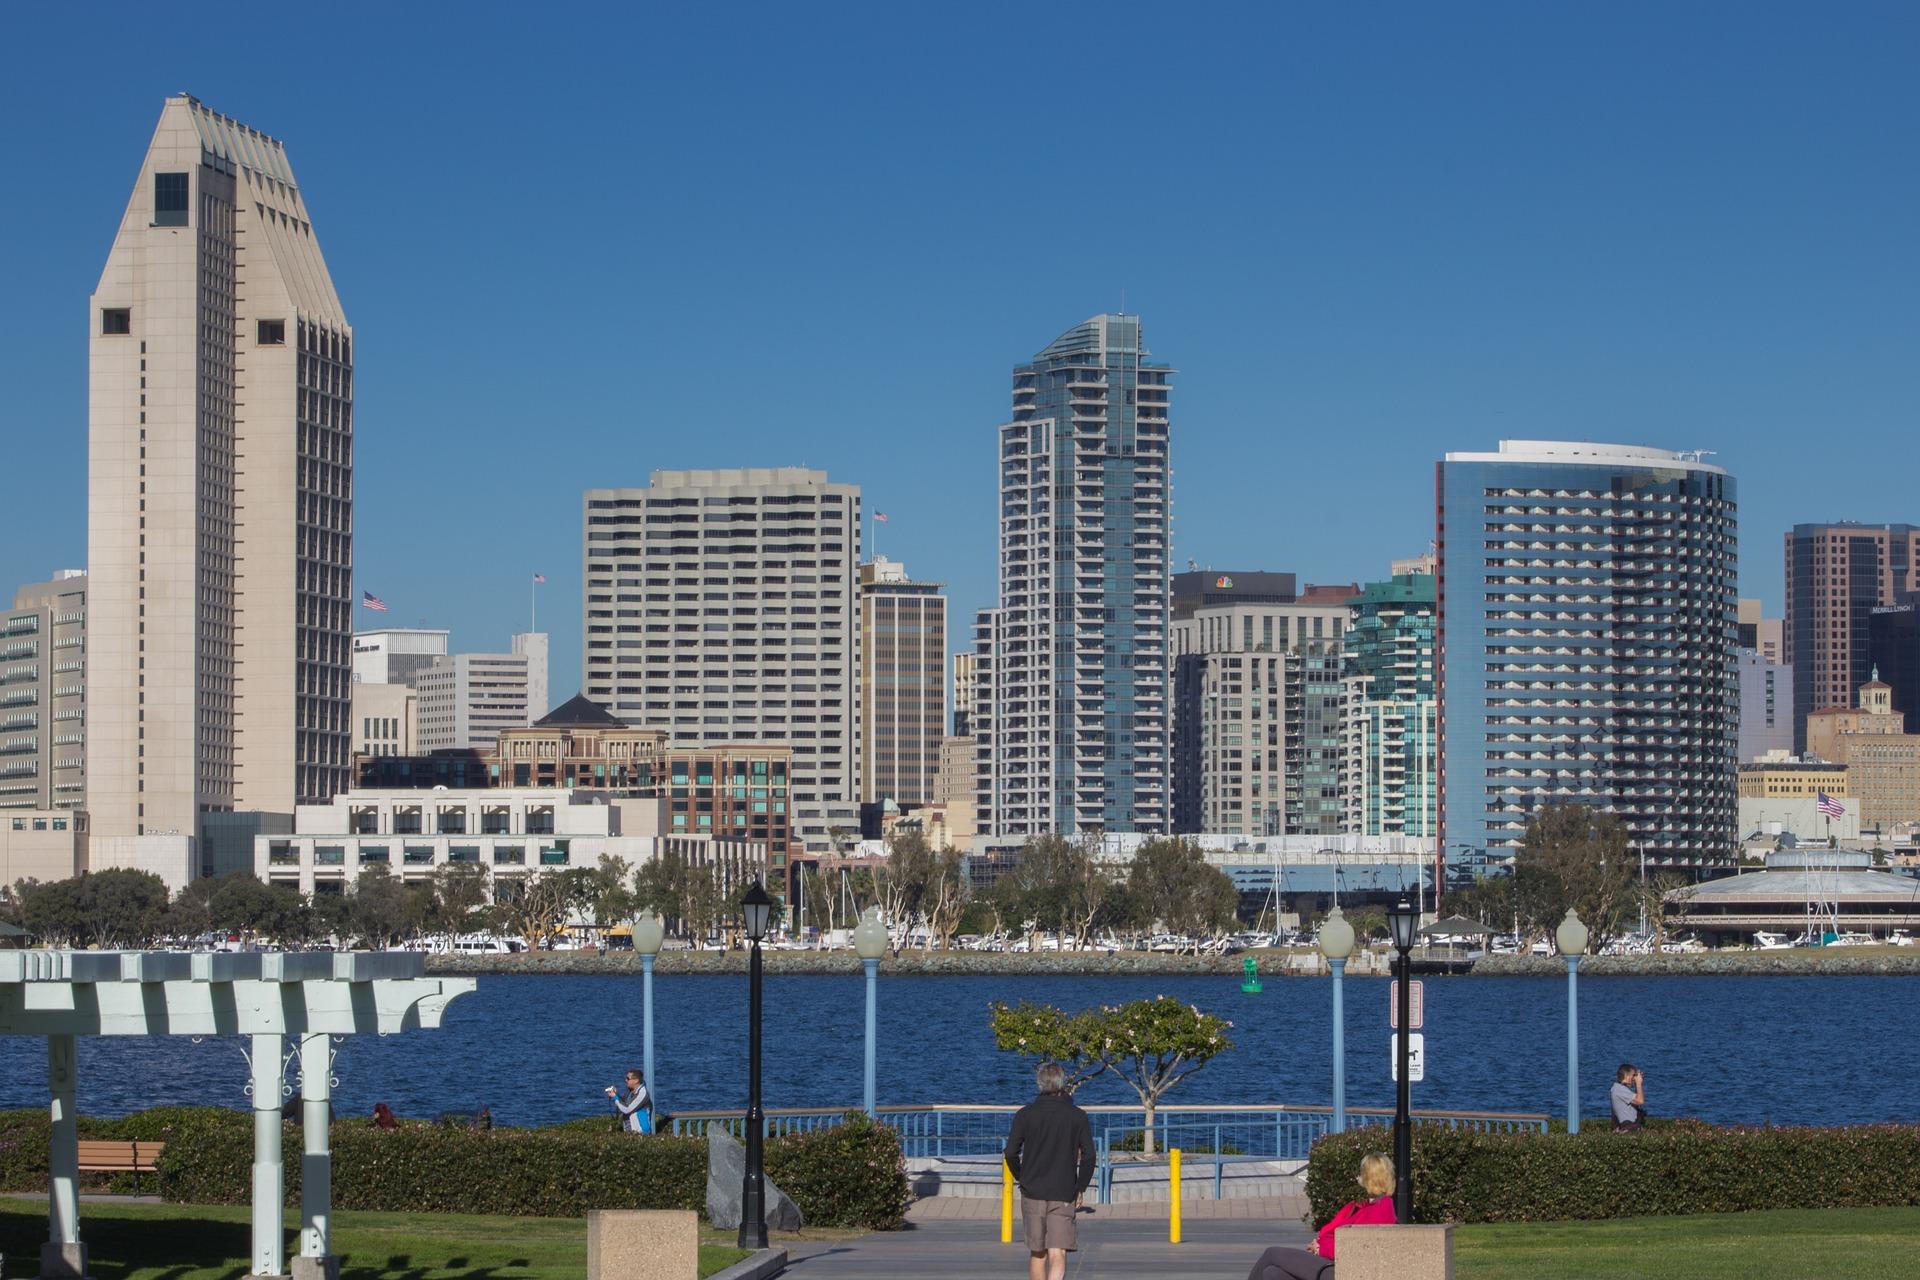 Used Office Furniture San Diego 619 738 5773 Buy Used